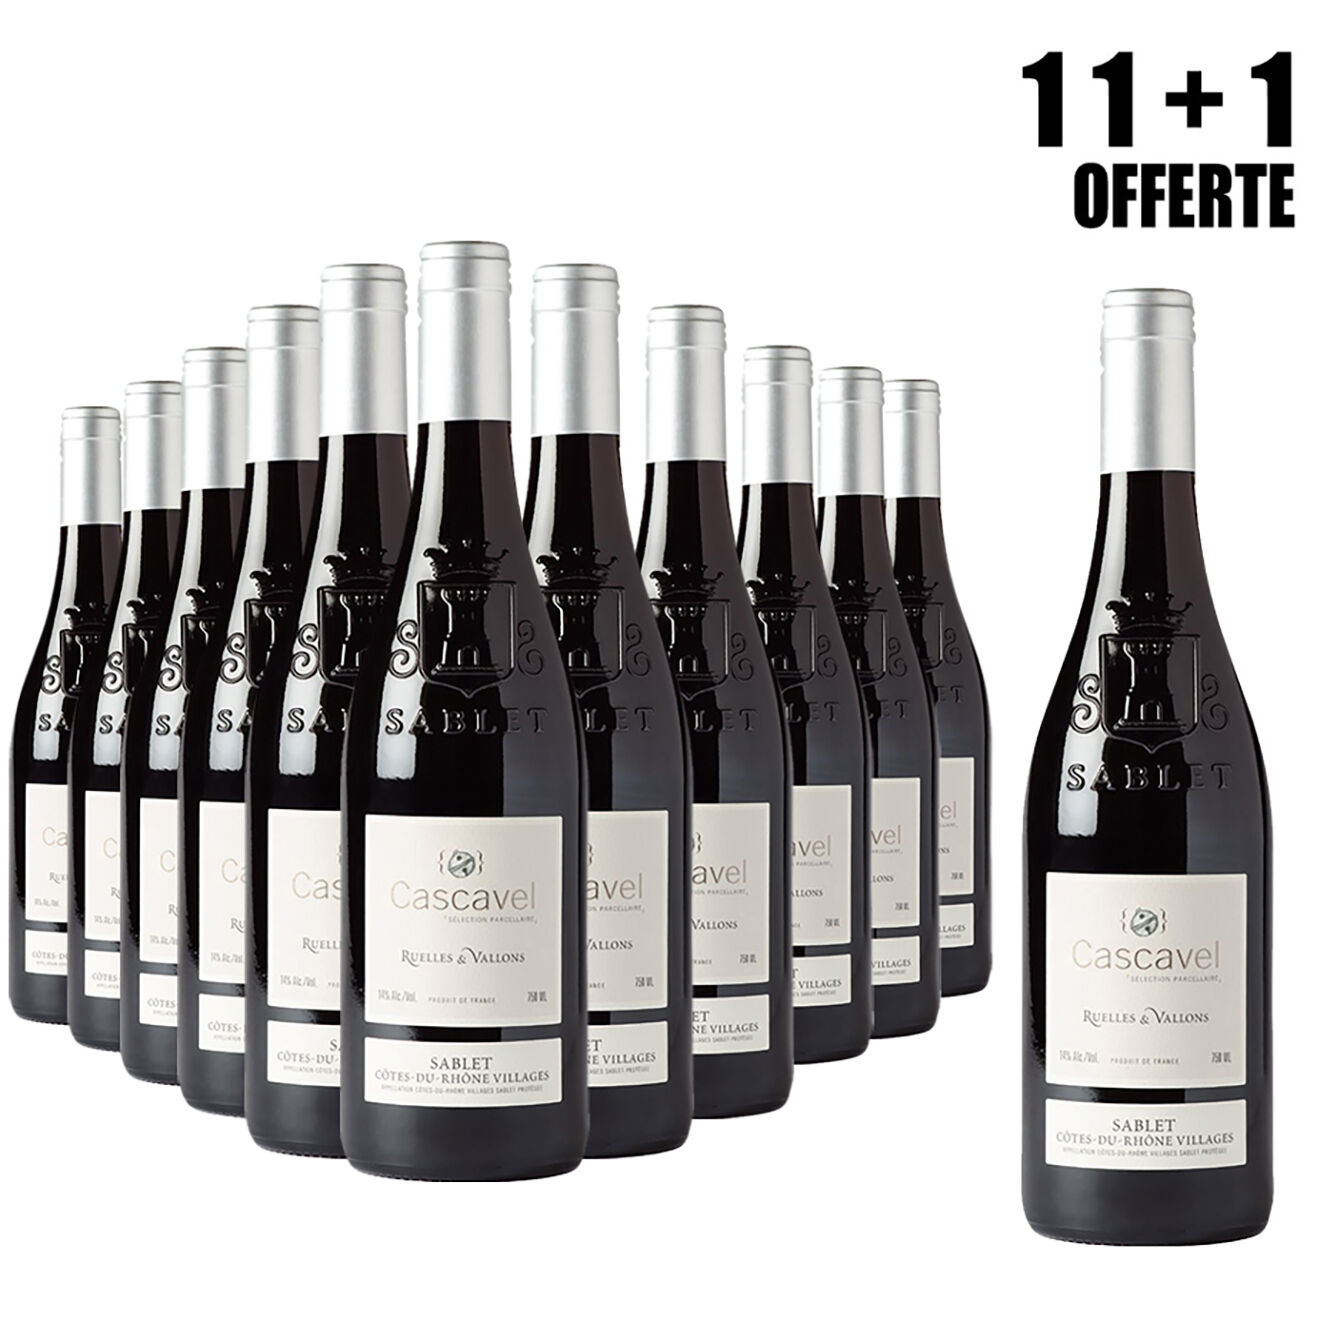 Lot de 11 Sablet Ruelles & Vallons 2015 Cascavel 75cl + 1 Offerte